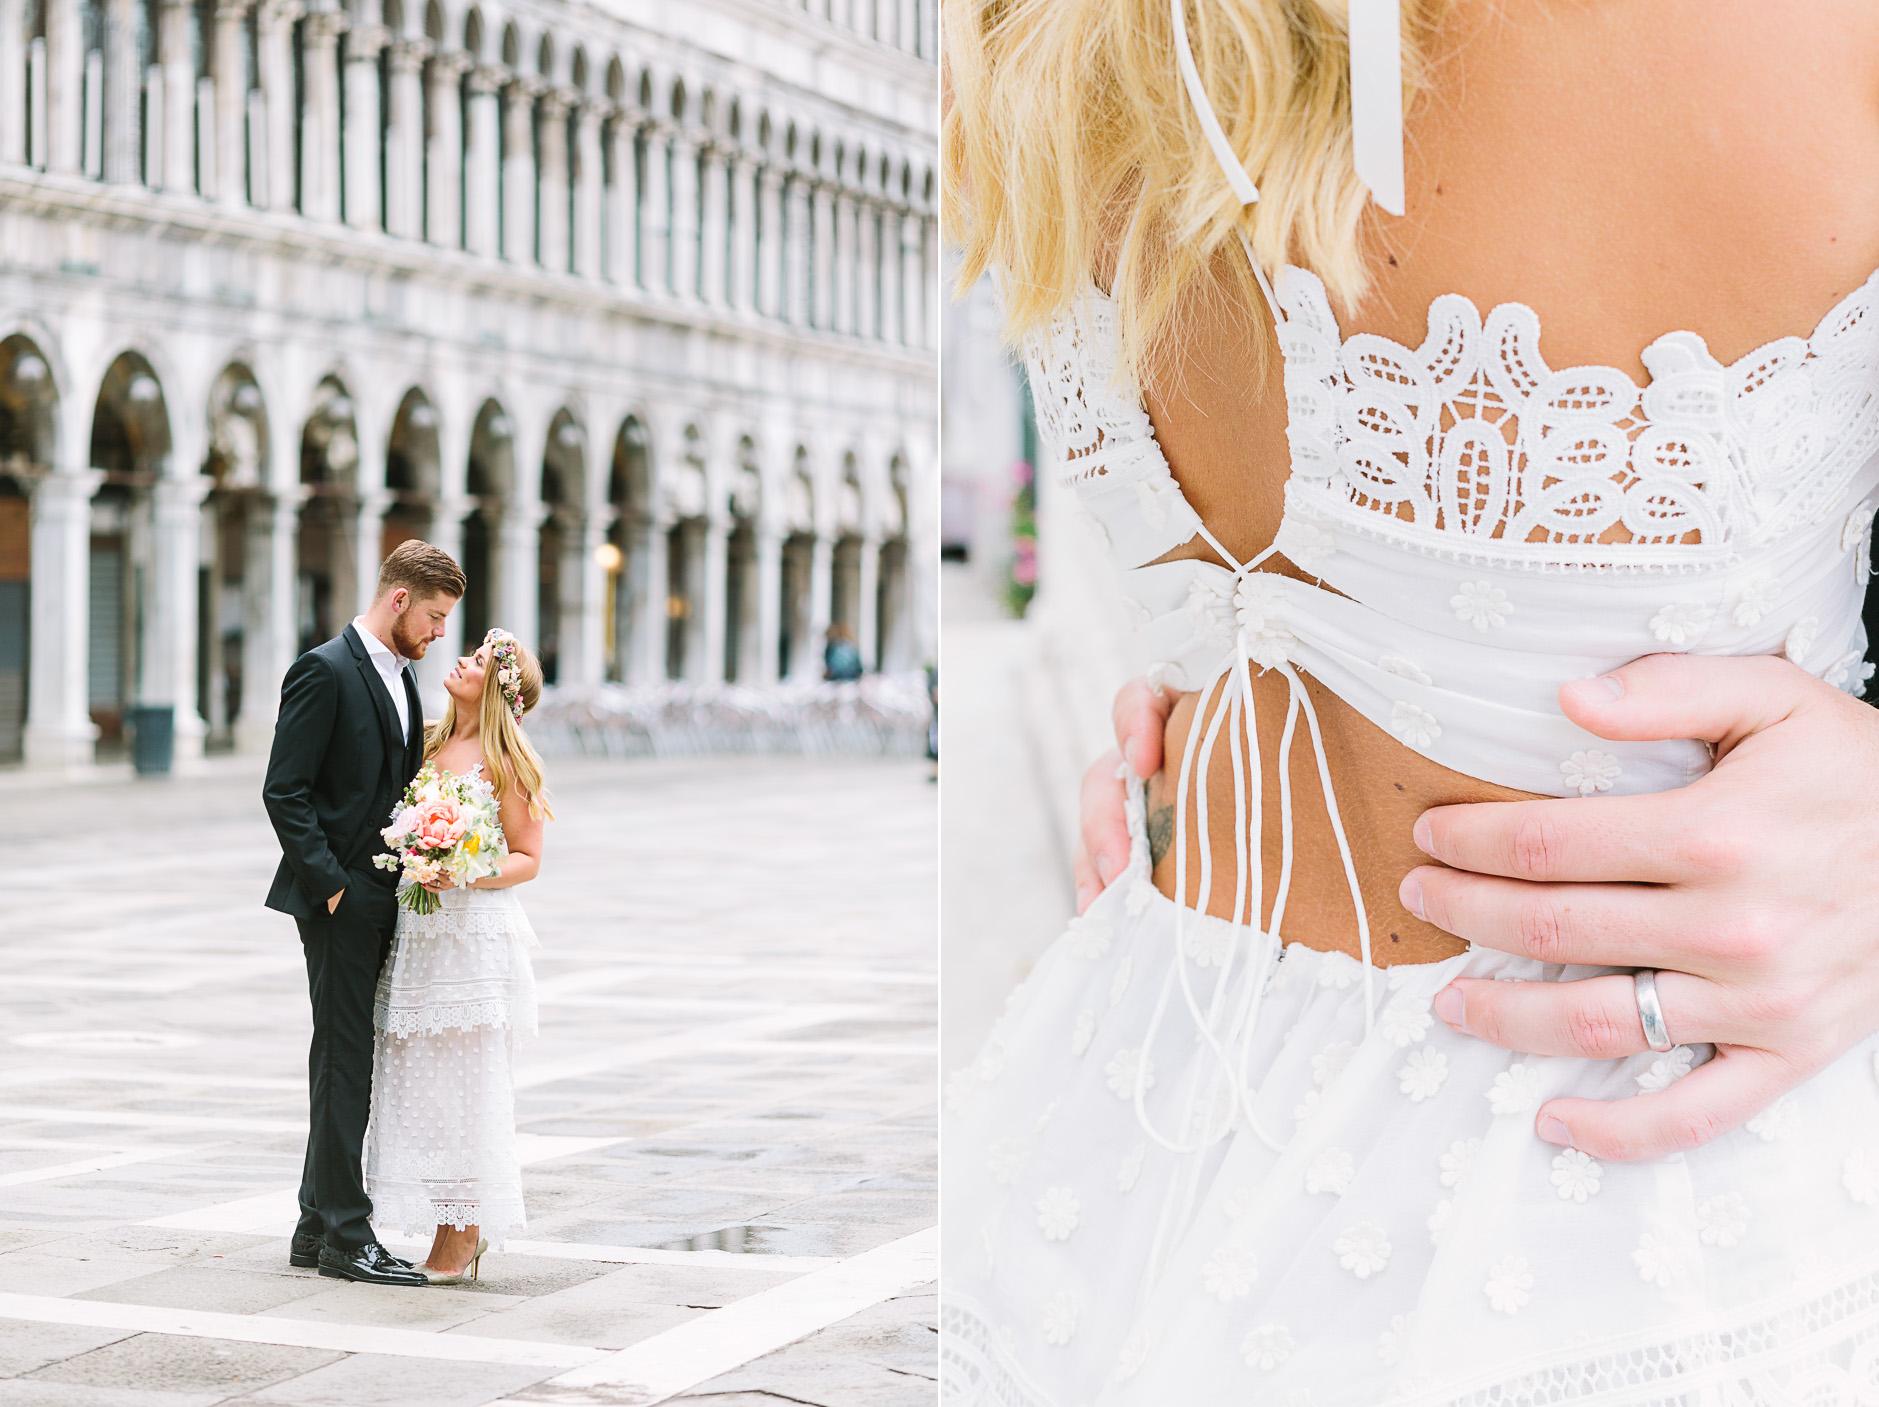 Hochzeitsfotograf Le Hai Linh Boho Chic After Wedding Shooting Venedig Timo Horn 1.FC Koeln 031.jpg